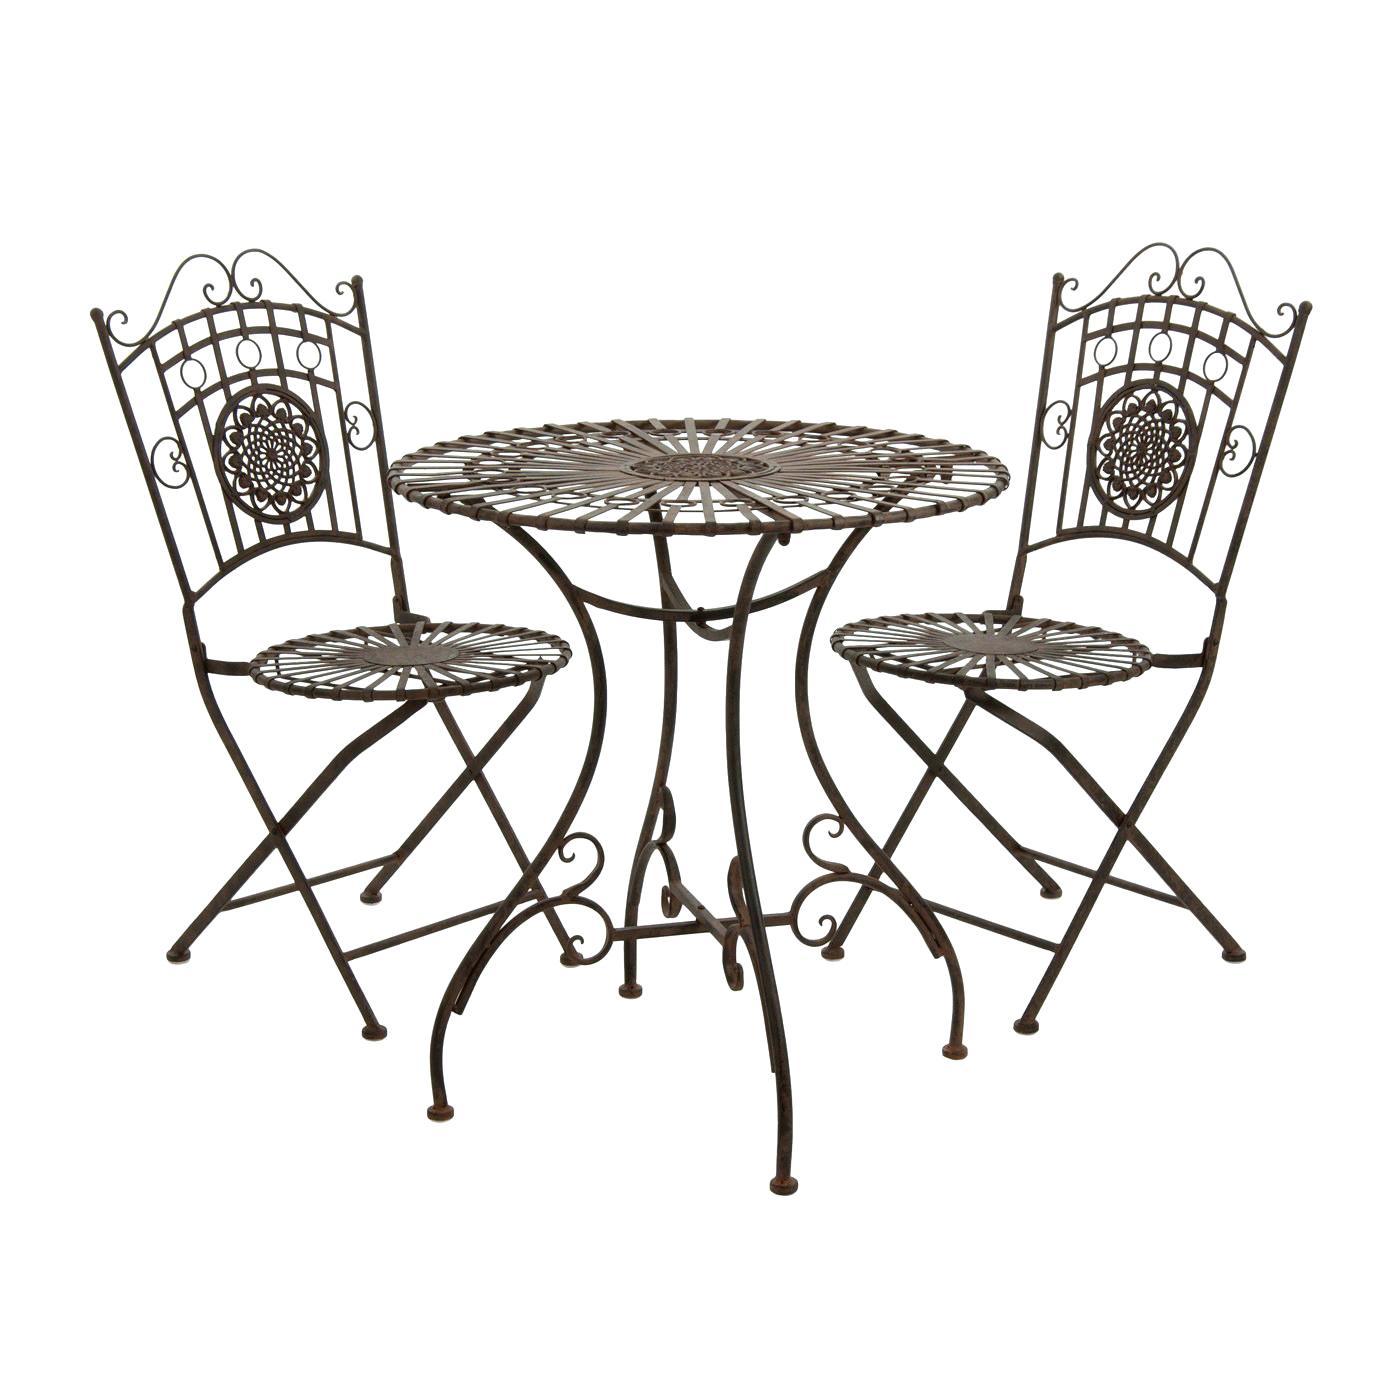 1400x1400 Metal Garden Table And Chairs Garden Metal Table Metal Garden